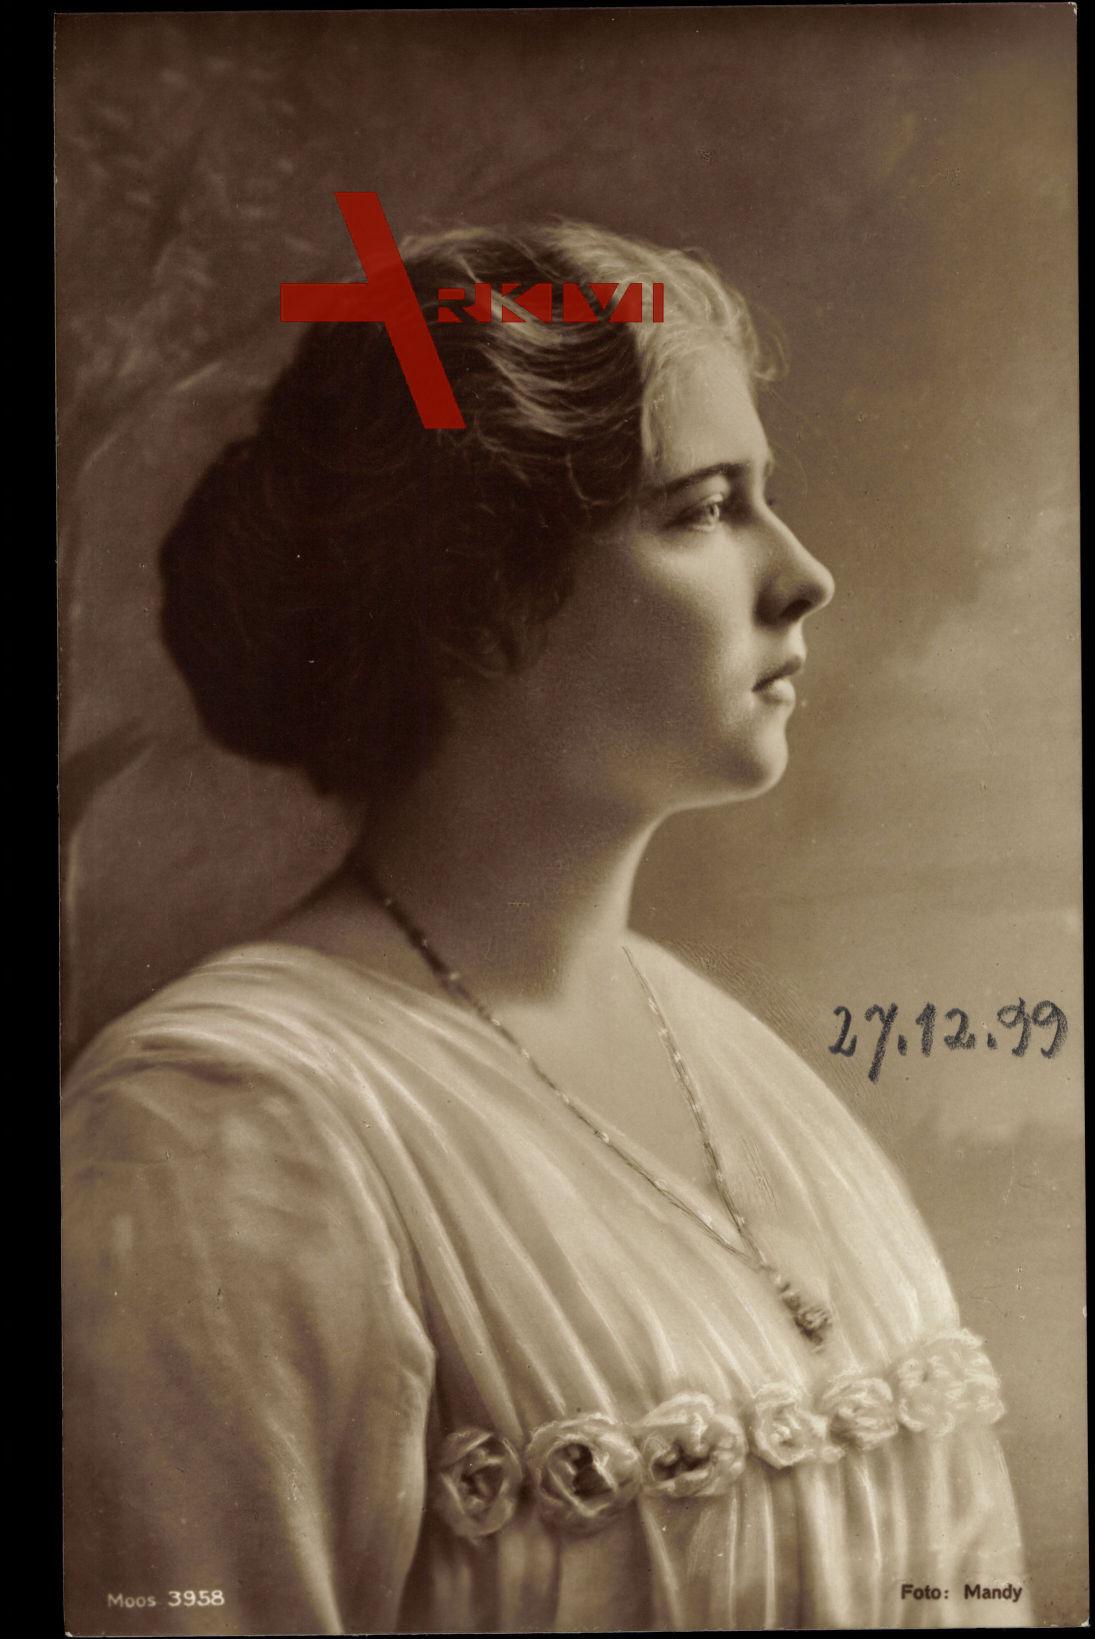 A.S.R. Printesa Maria, Adel Rumänien, Prinzessin